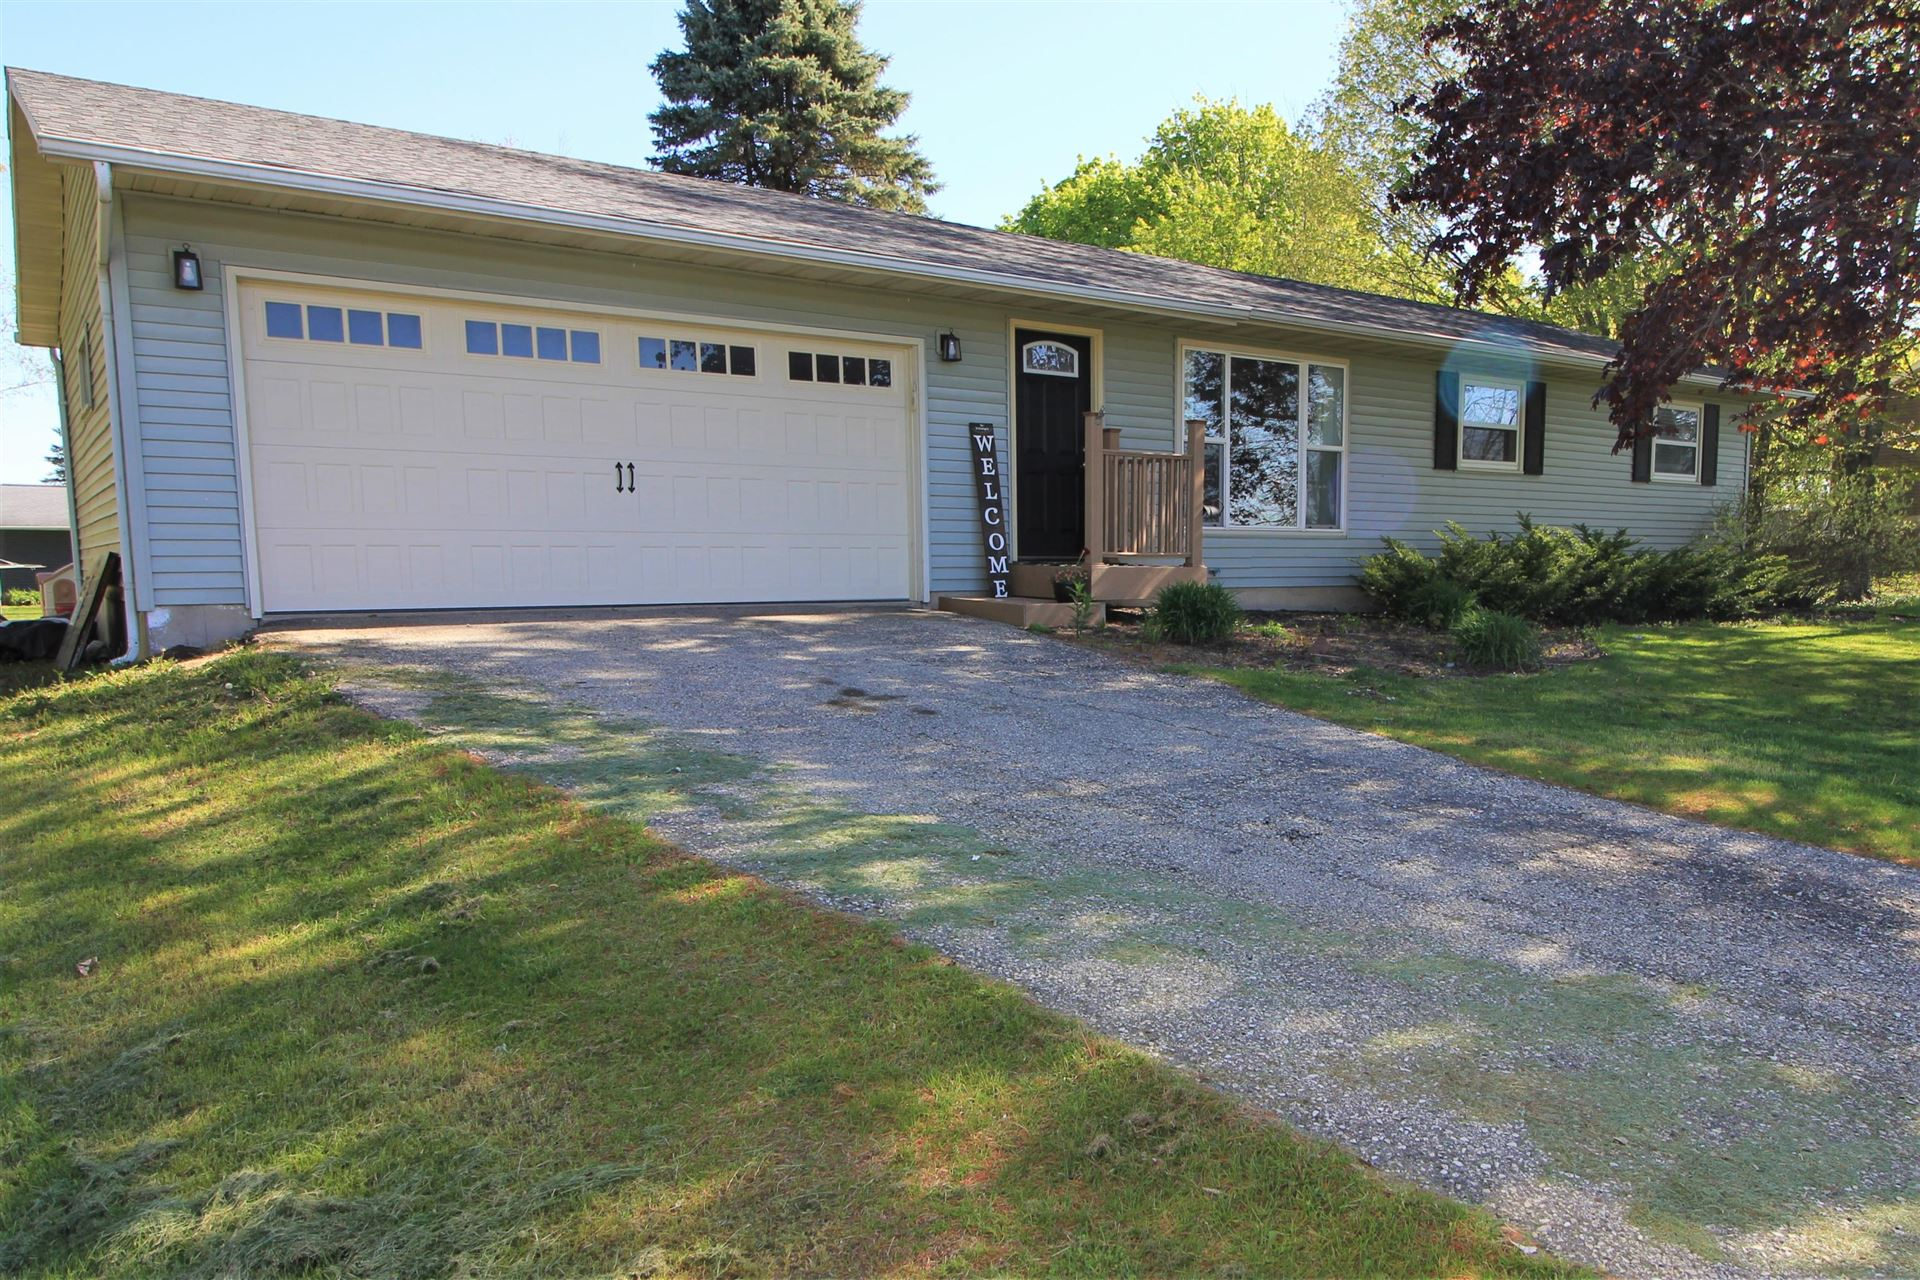 E7602 E Smith Rd, Viroqua, WI 54667 - MLS#: 1740018